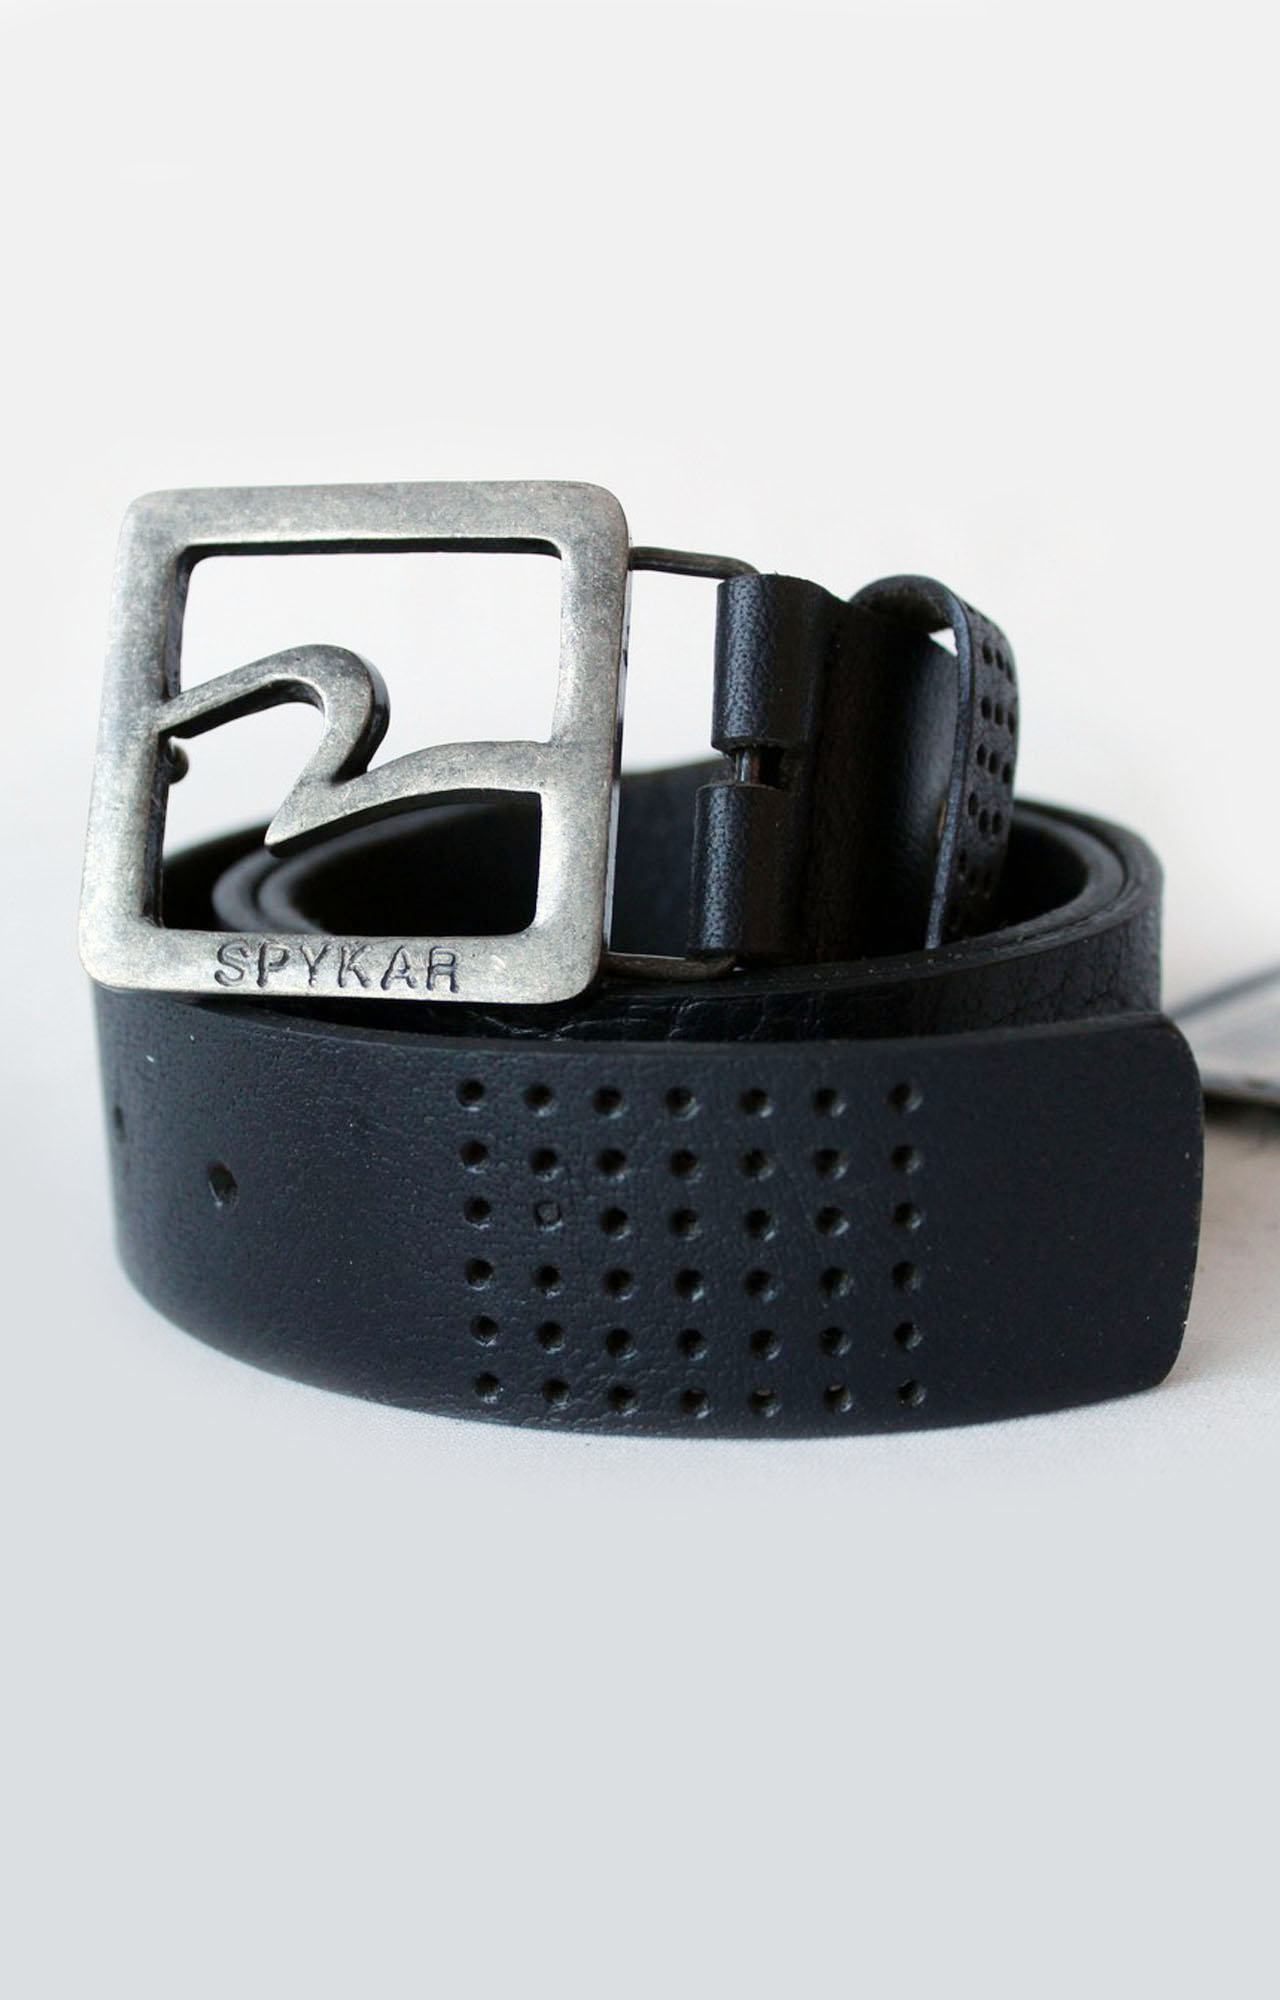 Spykar   Spykar Black Leather Belt